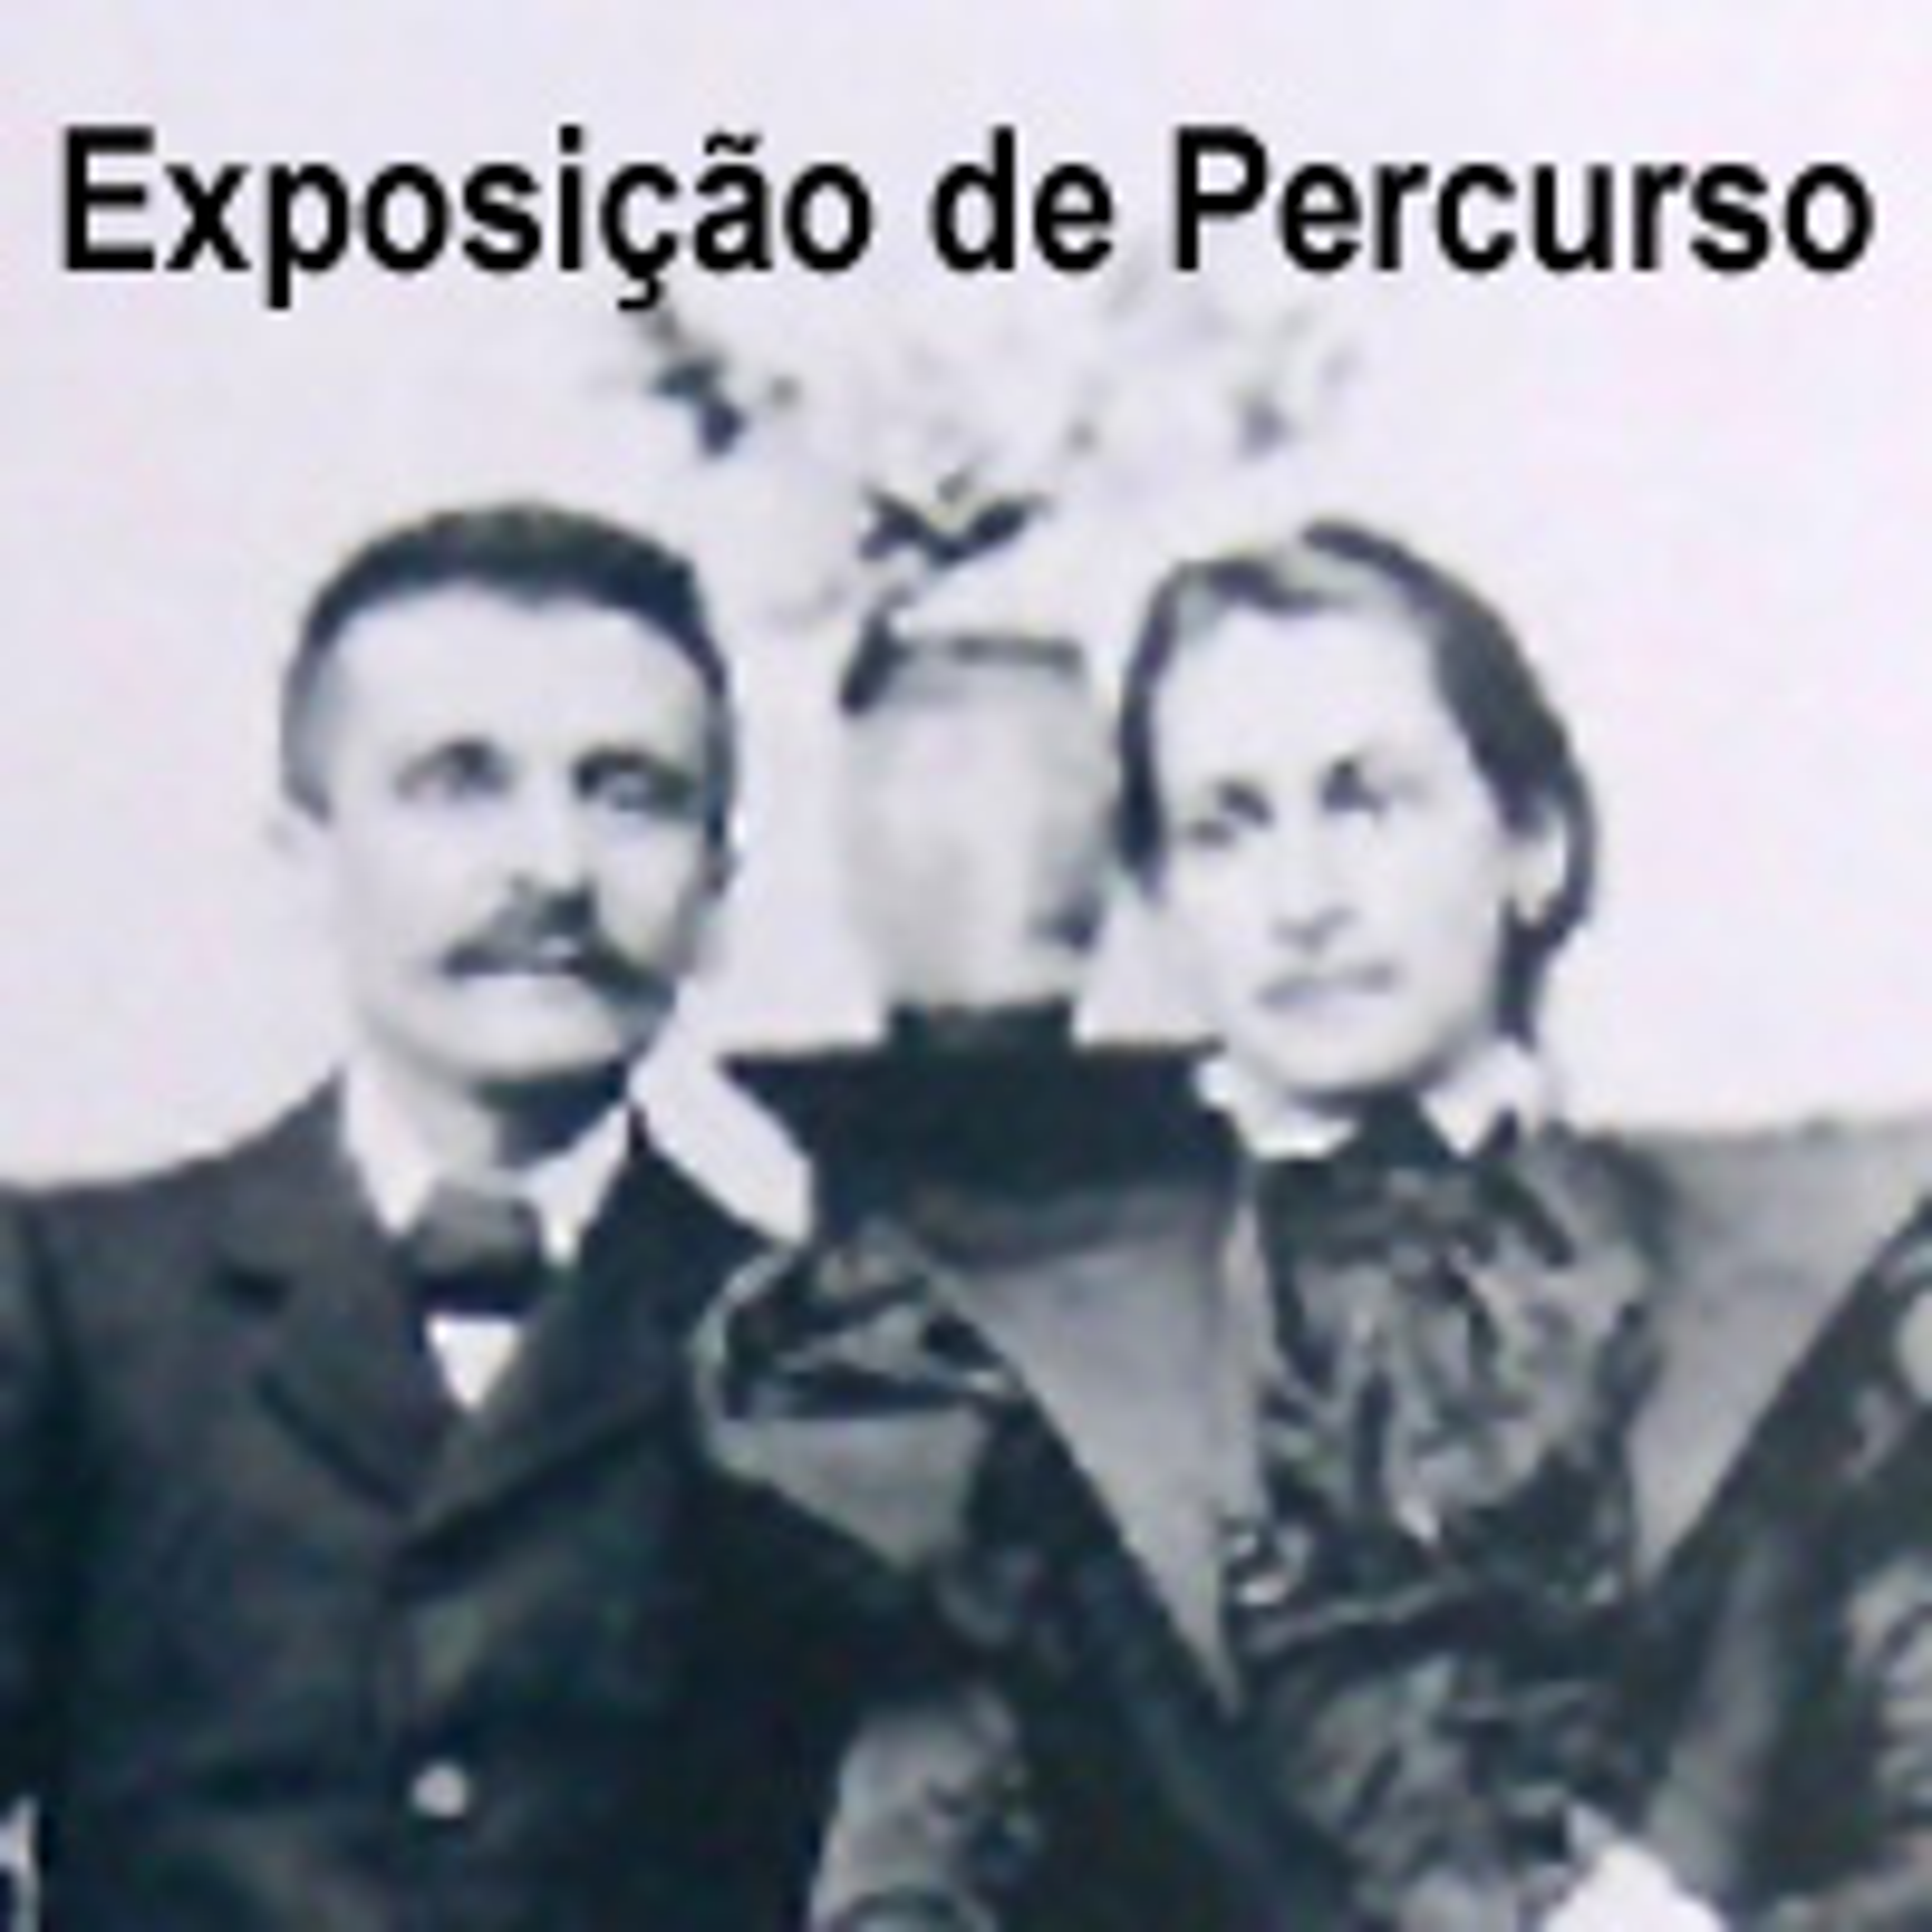 rioecultura : EXPO Exposição de Percurso : Museu Casa de Benjamin Constant